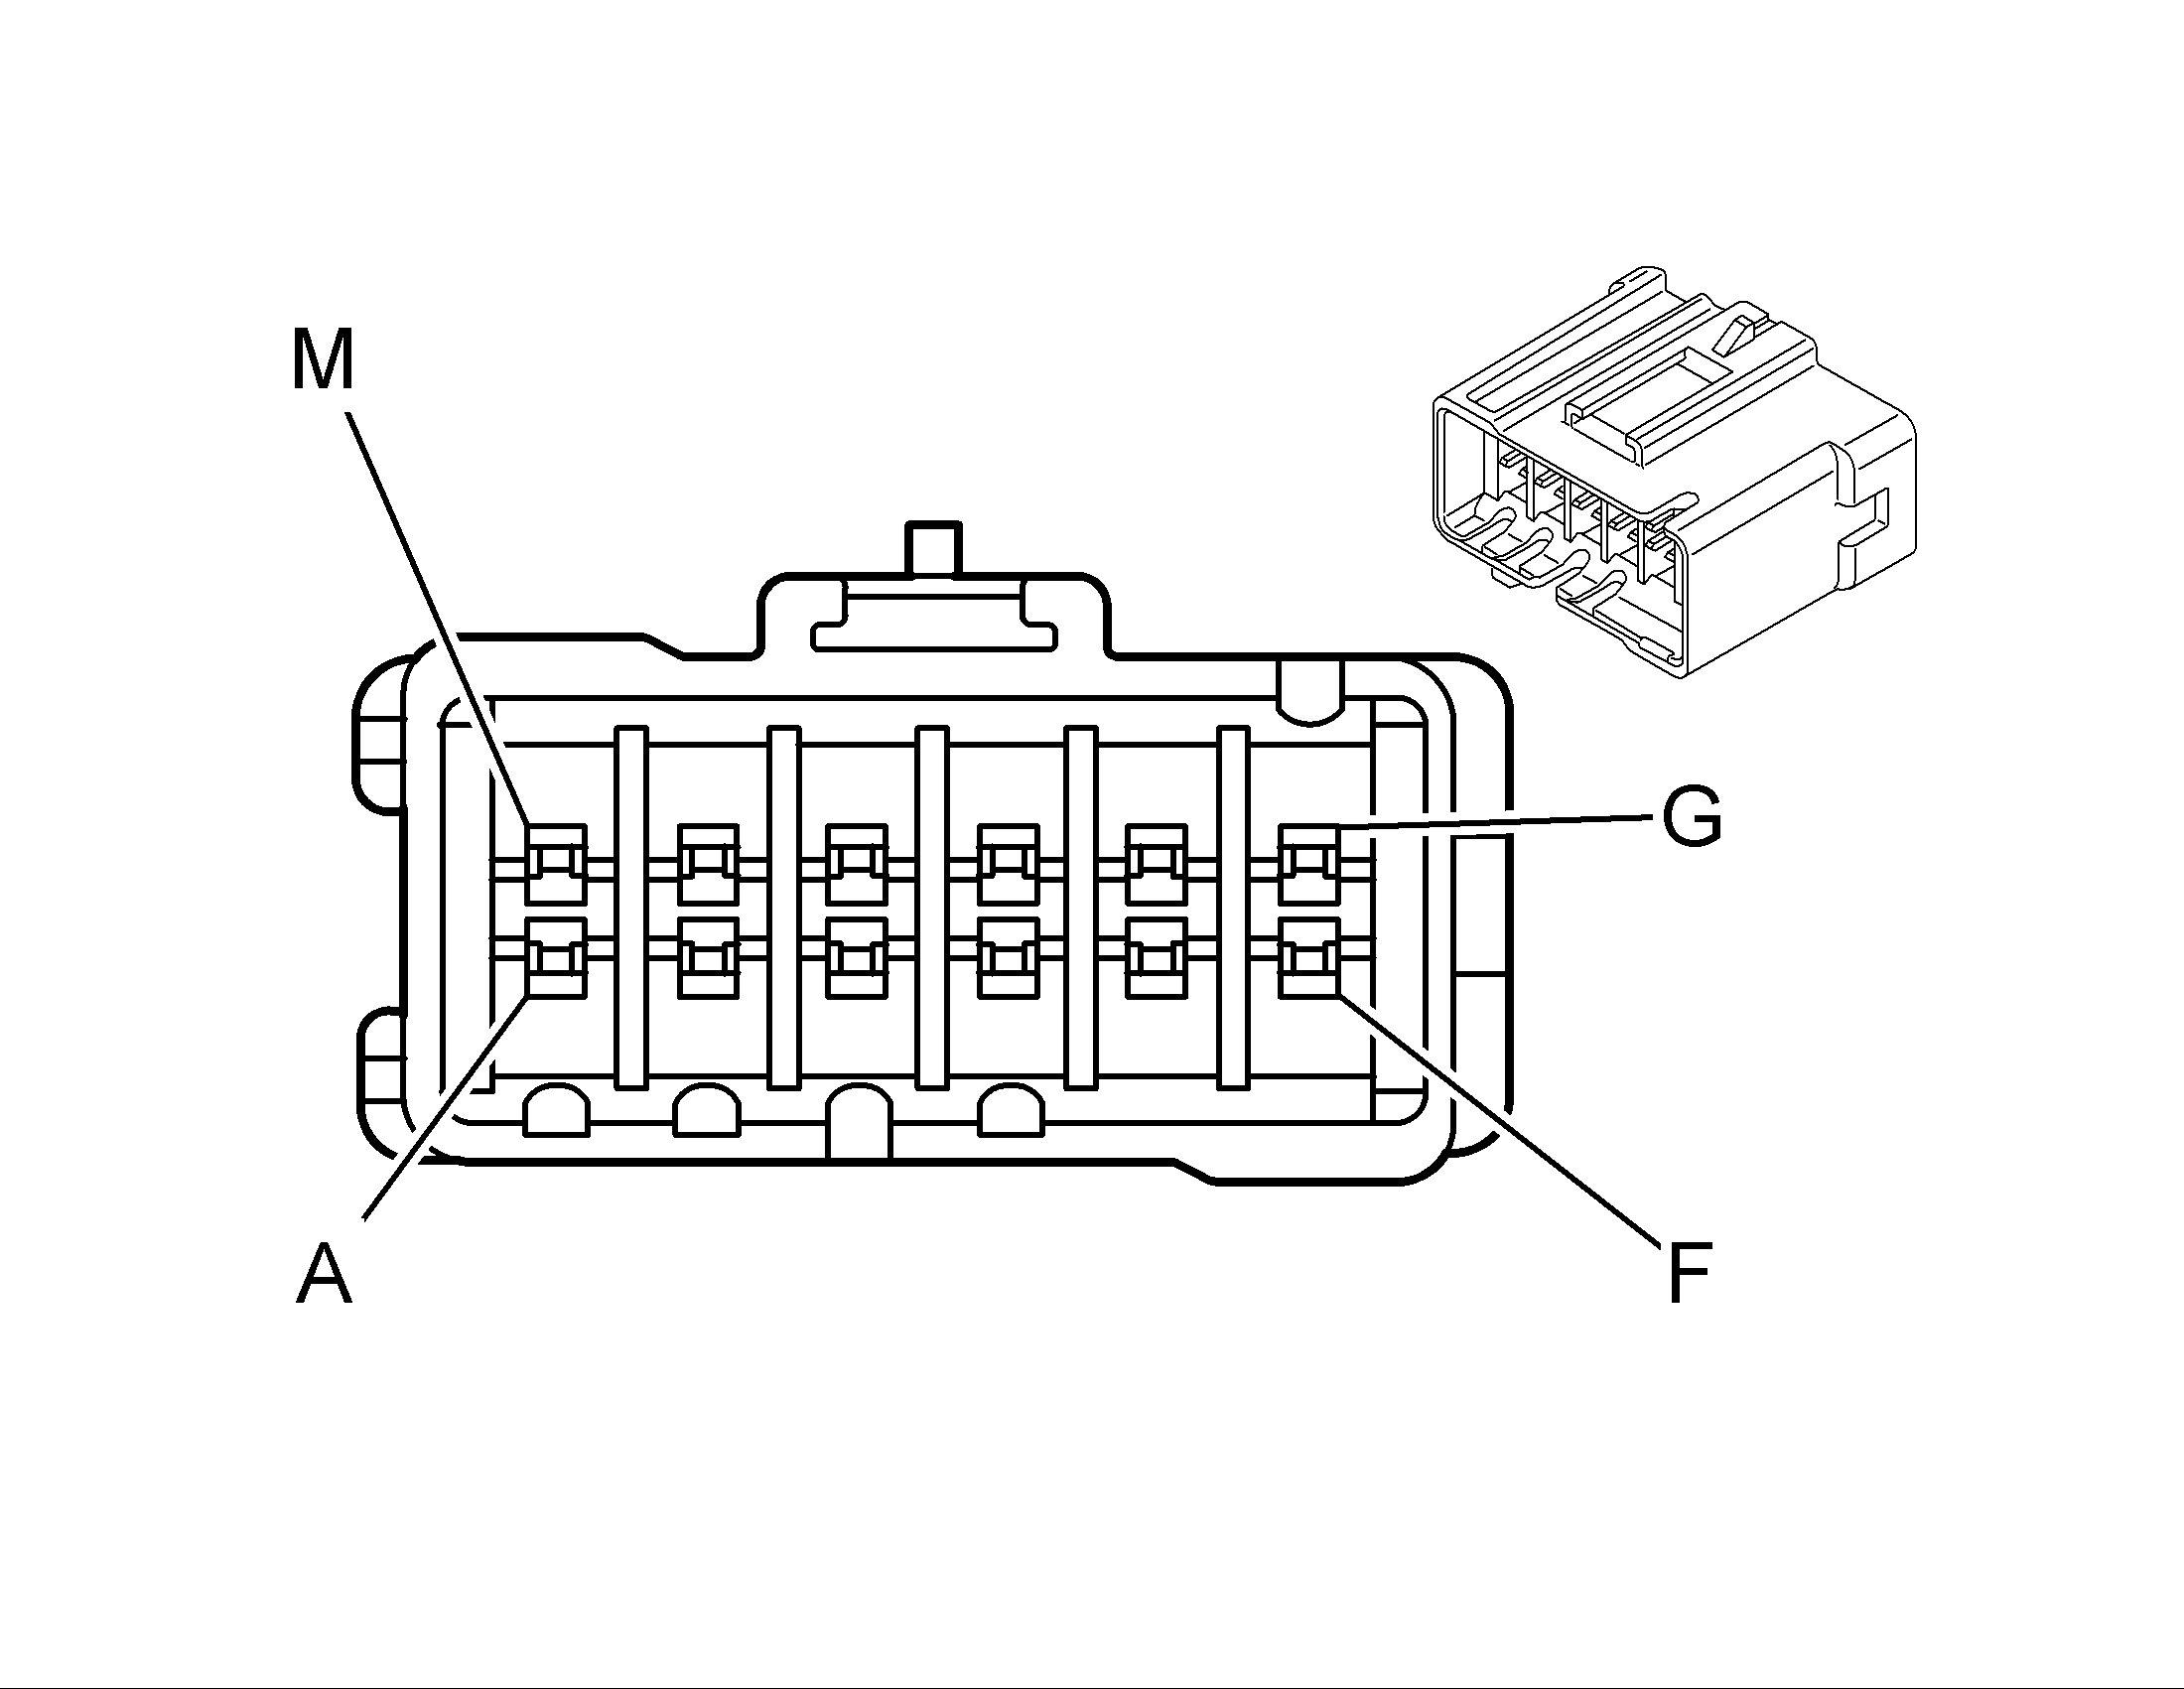 er motor schematic